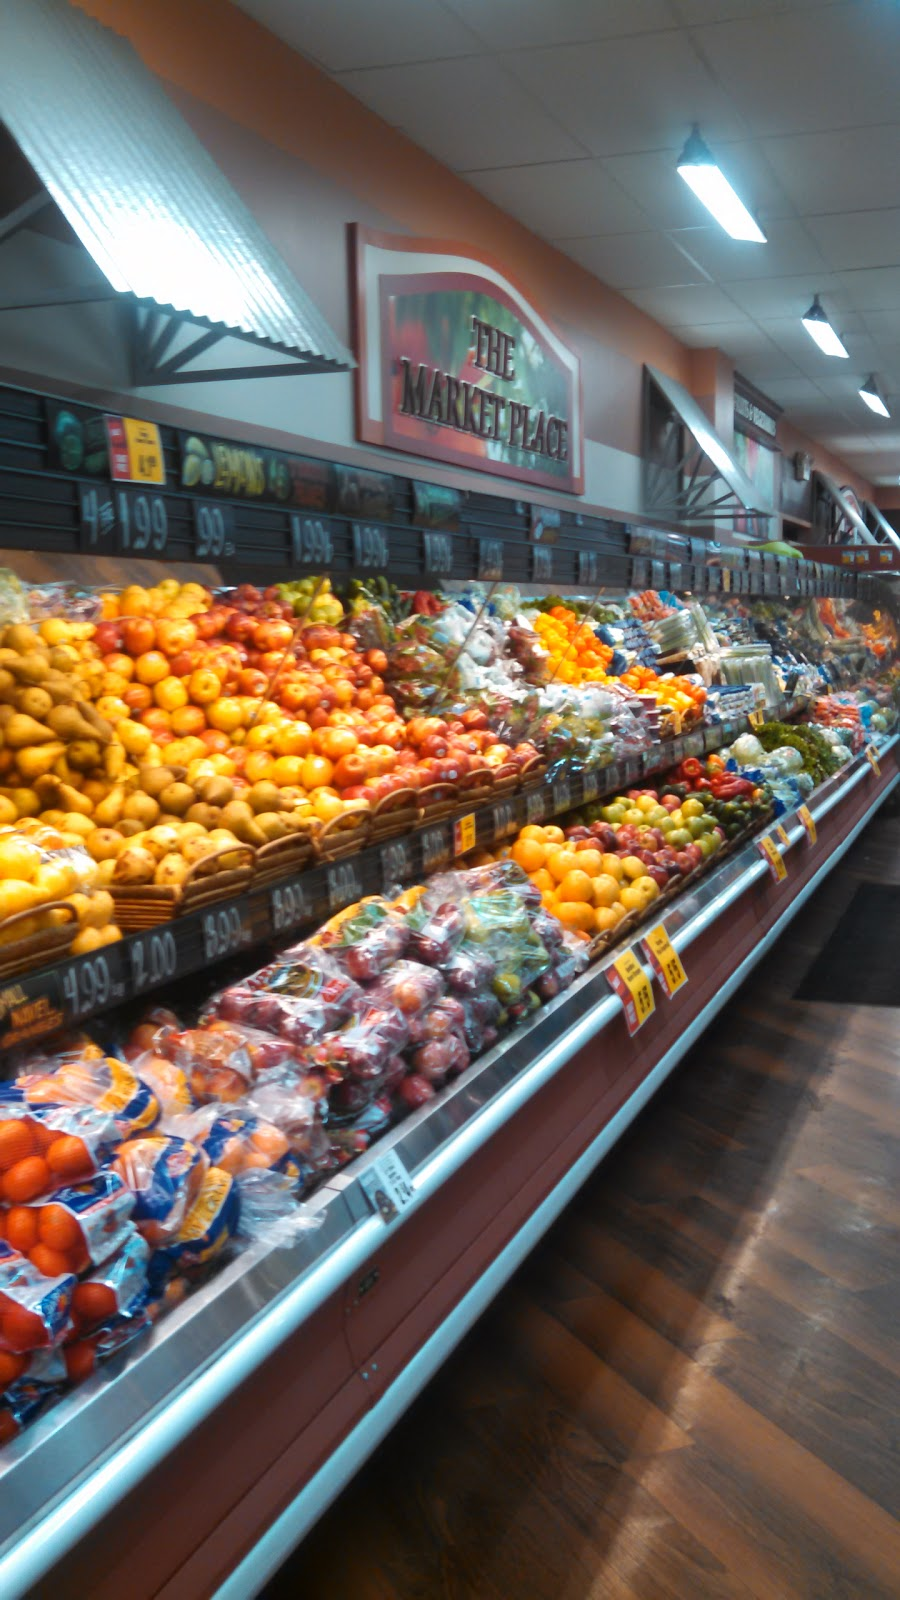 Foodtown of Shickshinny - florist  | Photo 1 of 9 | Address: 5 Mountain Mall, Shickshinny, PA 18655, USA | Phone: (570) 542-5522